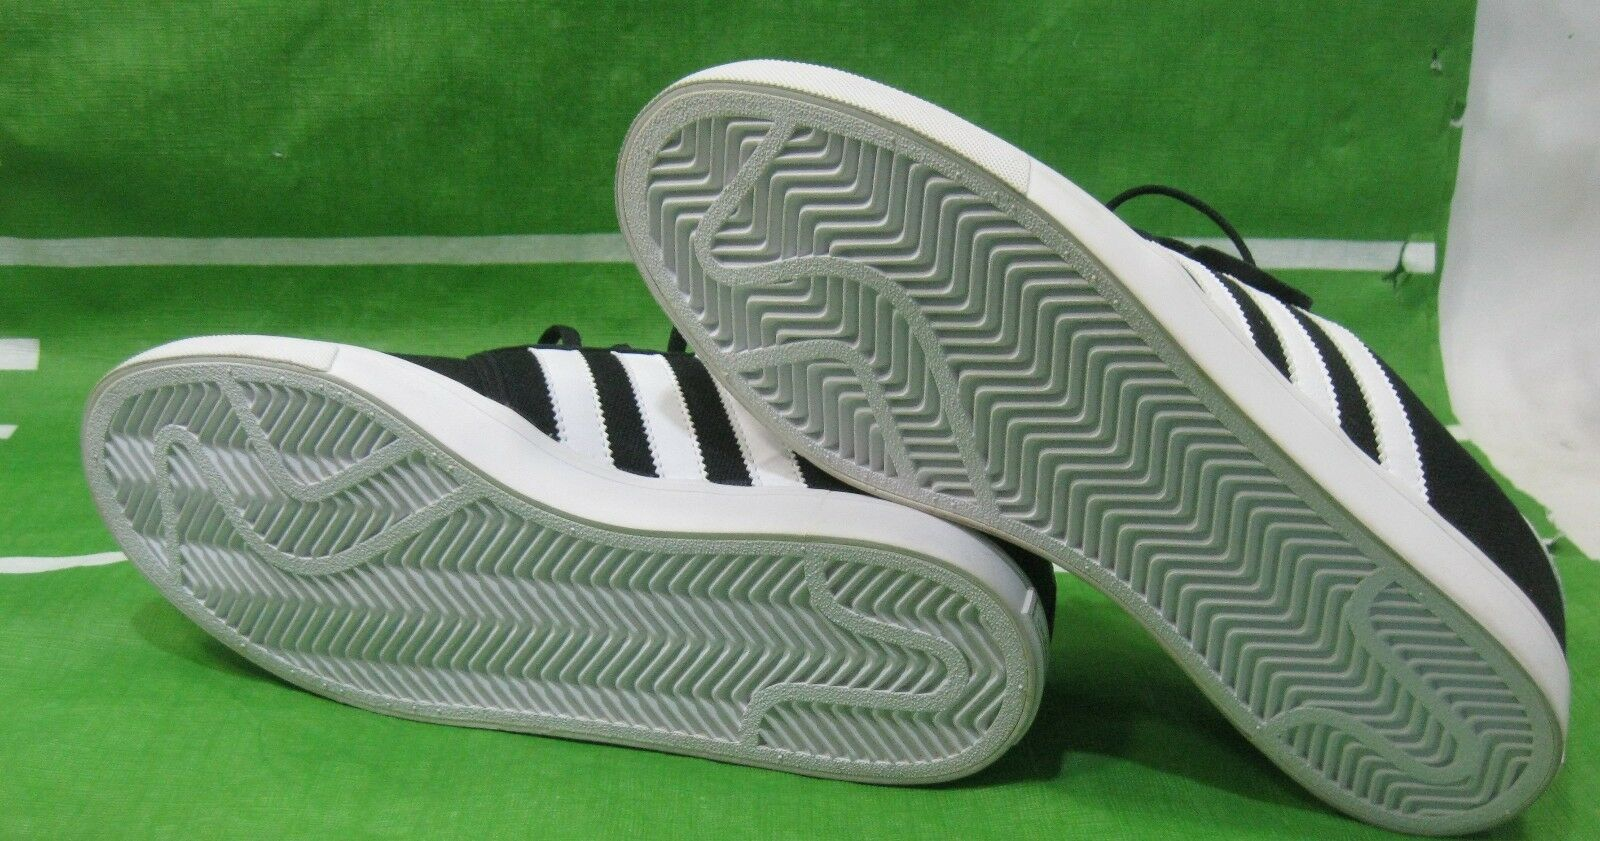 Adidas Originali Uomo Seeley Tela Tela Tela Sneaker, G23703, Nero/Bianco Taglia 8 7fa5b8